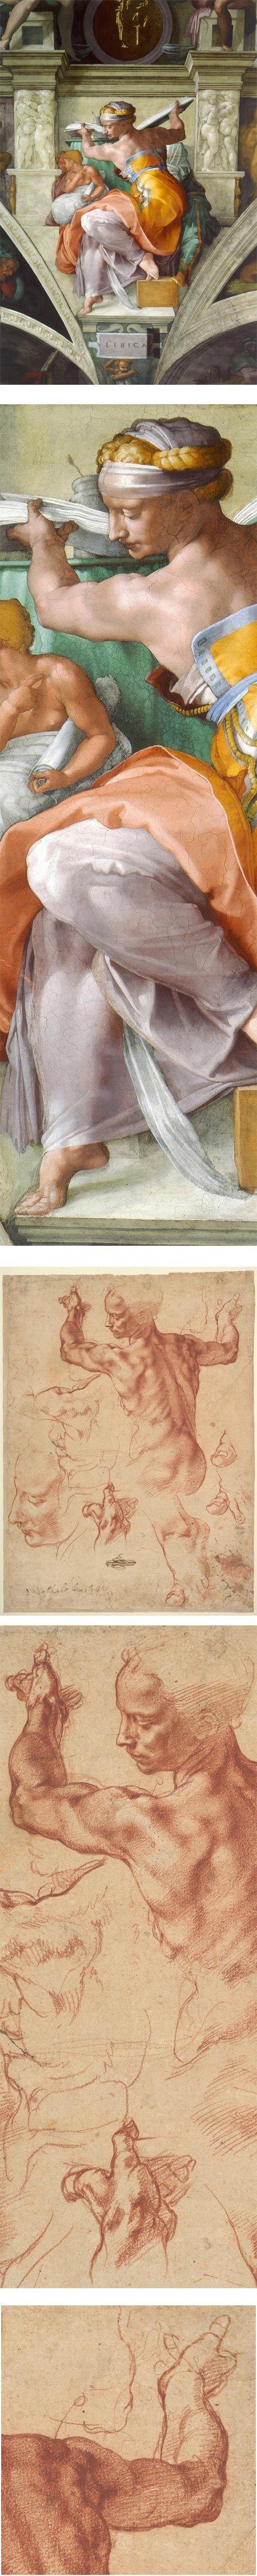 MICHELANGELO Buonarroti (1475-1564) - The Libyan Sibyl and Studies, 1511, Cappella Sistina, Vatican